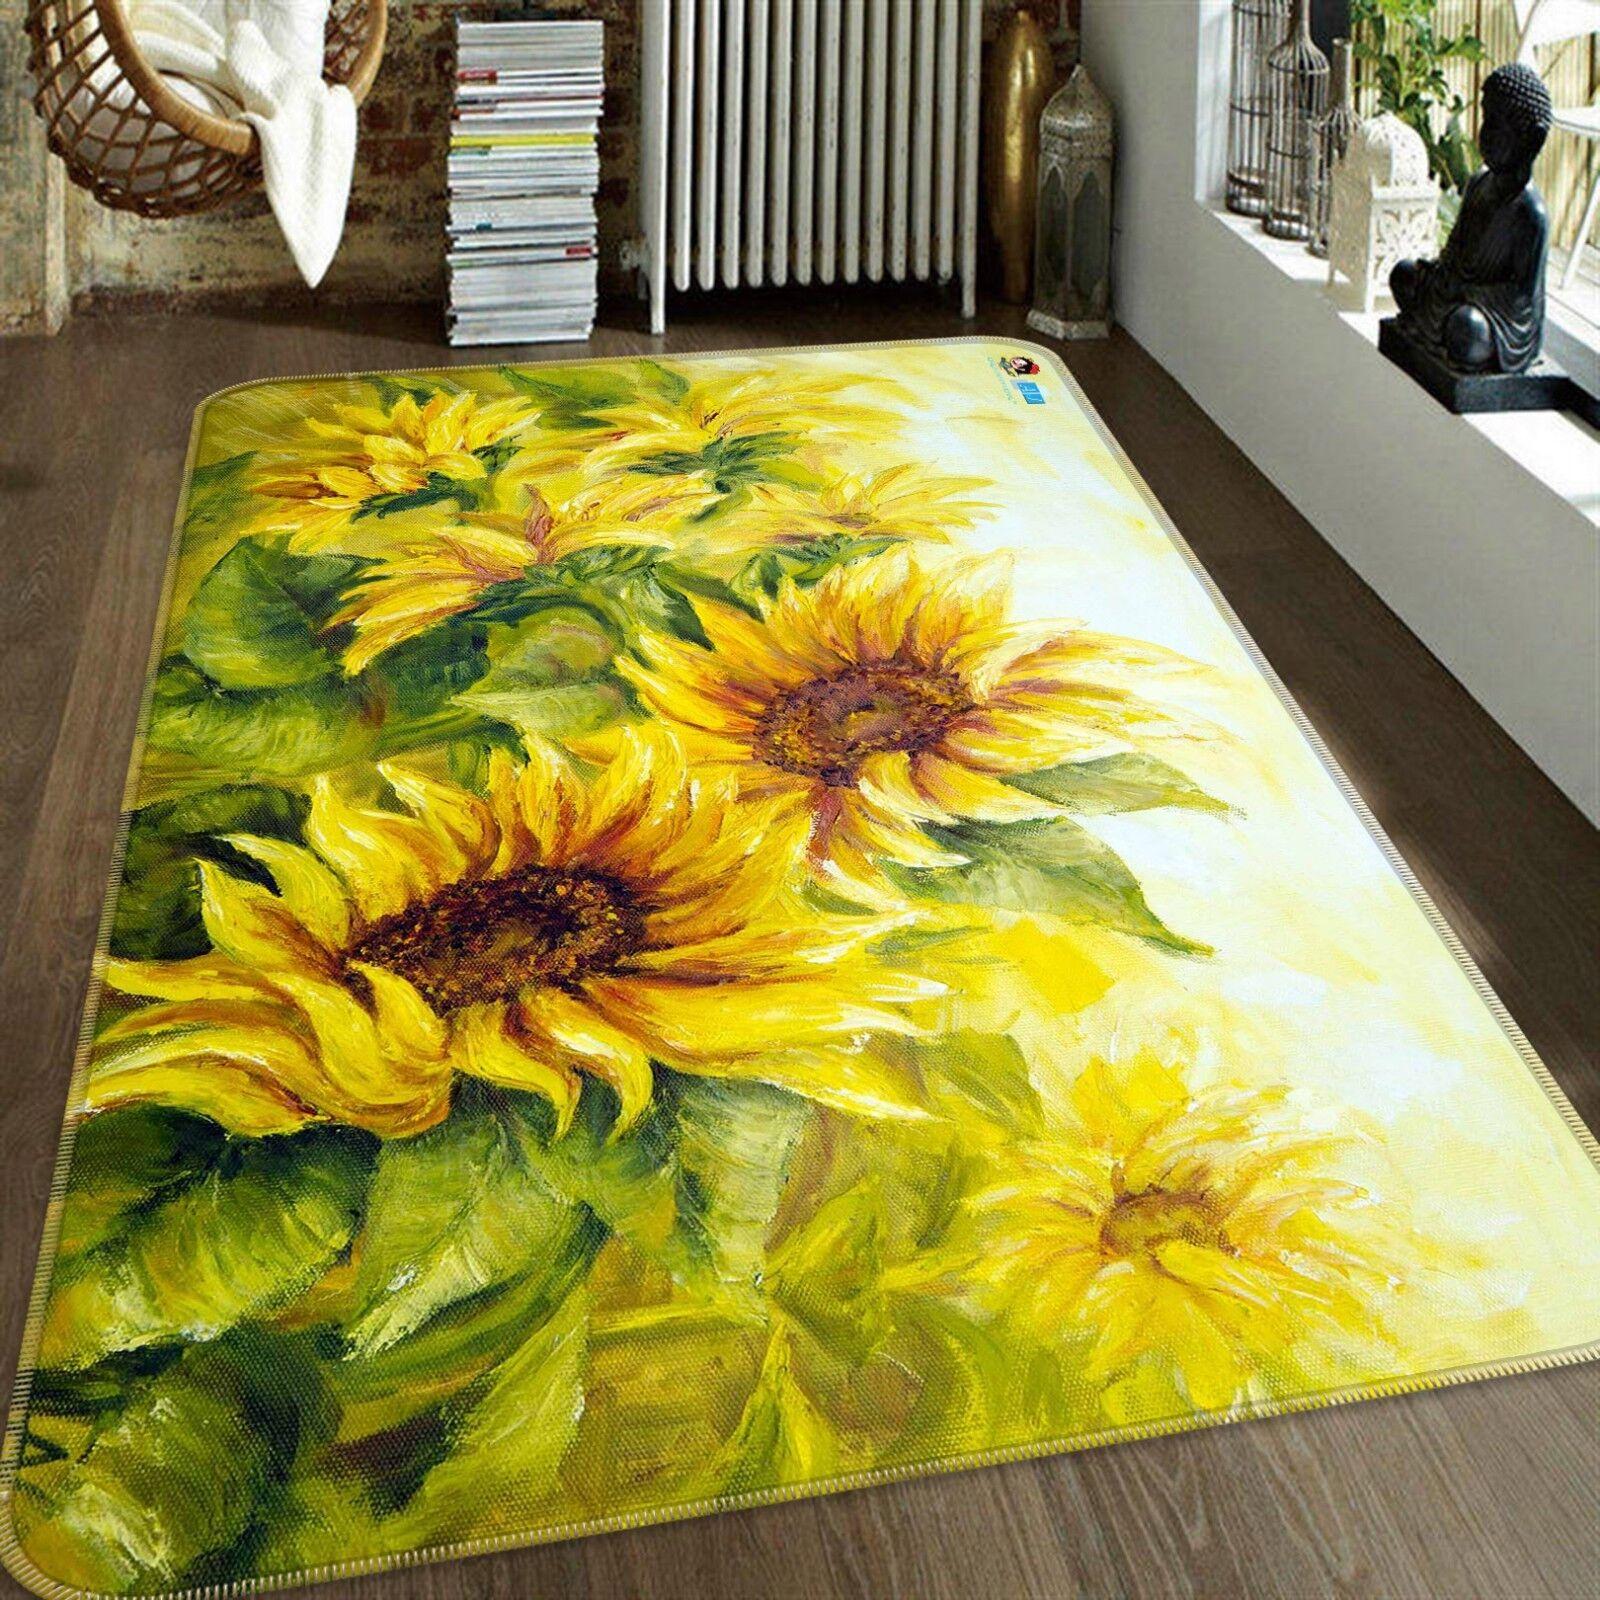 3D Draw Sunflowers 42 Tapis antidérapant pour tapis Tapis de qualité élégant tapis photo UK